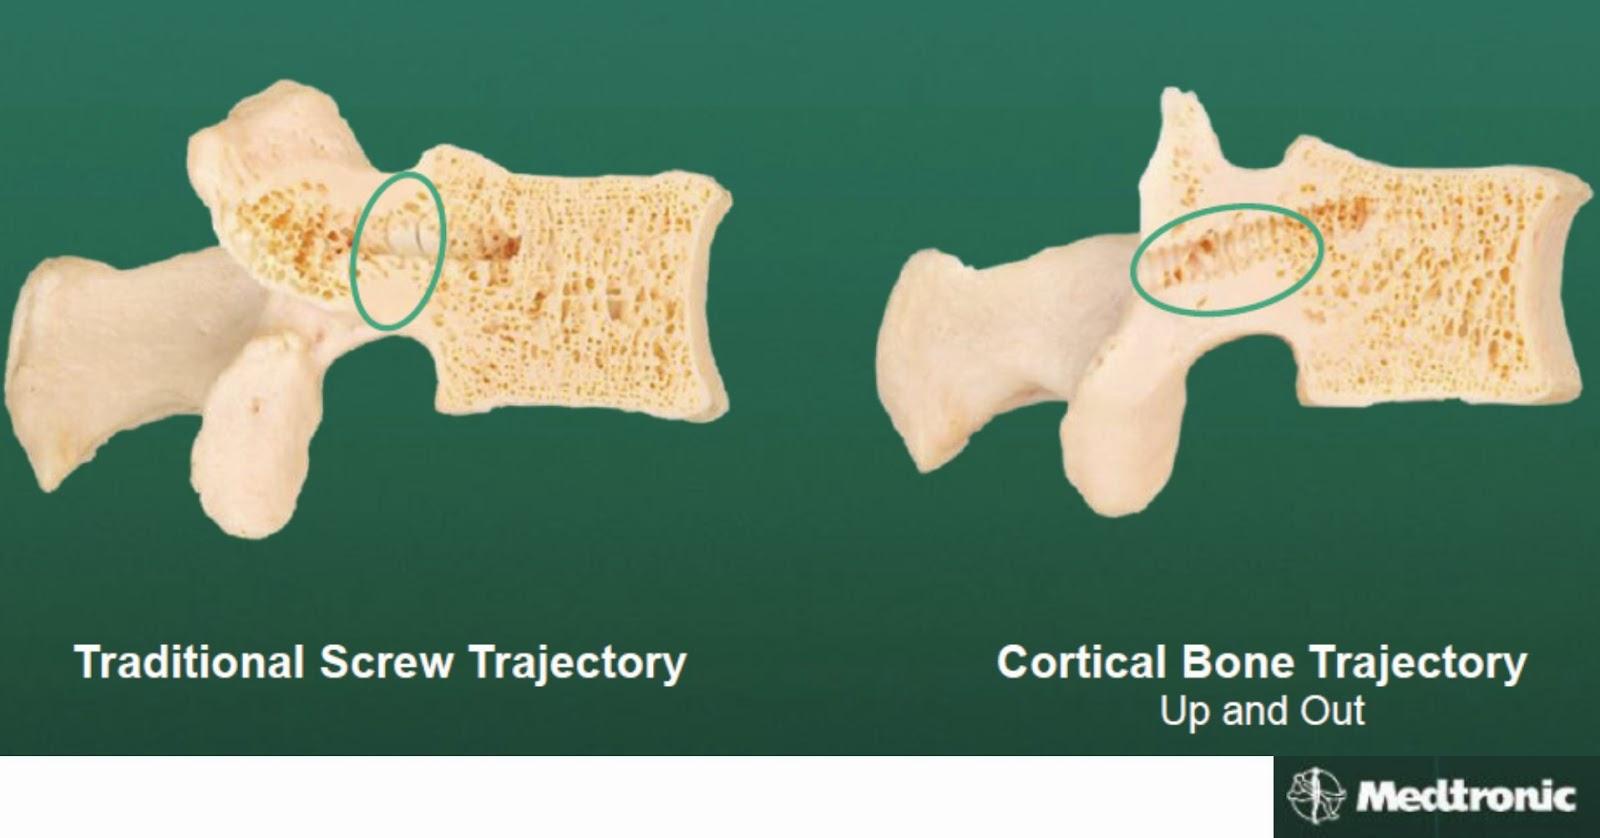 Midlif Cortical Bone Trajectoty Technique Spine Neurosurgeon Dr